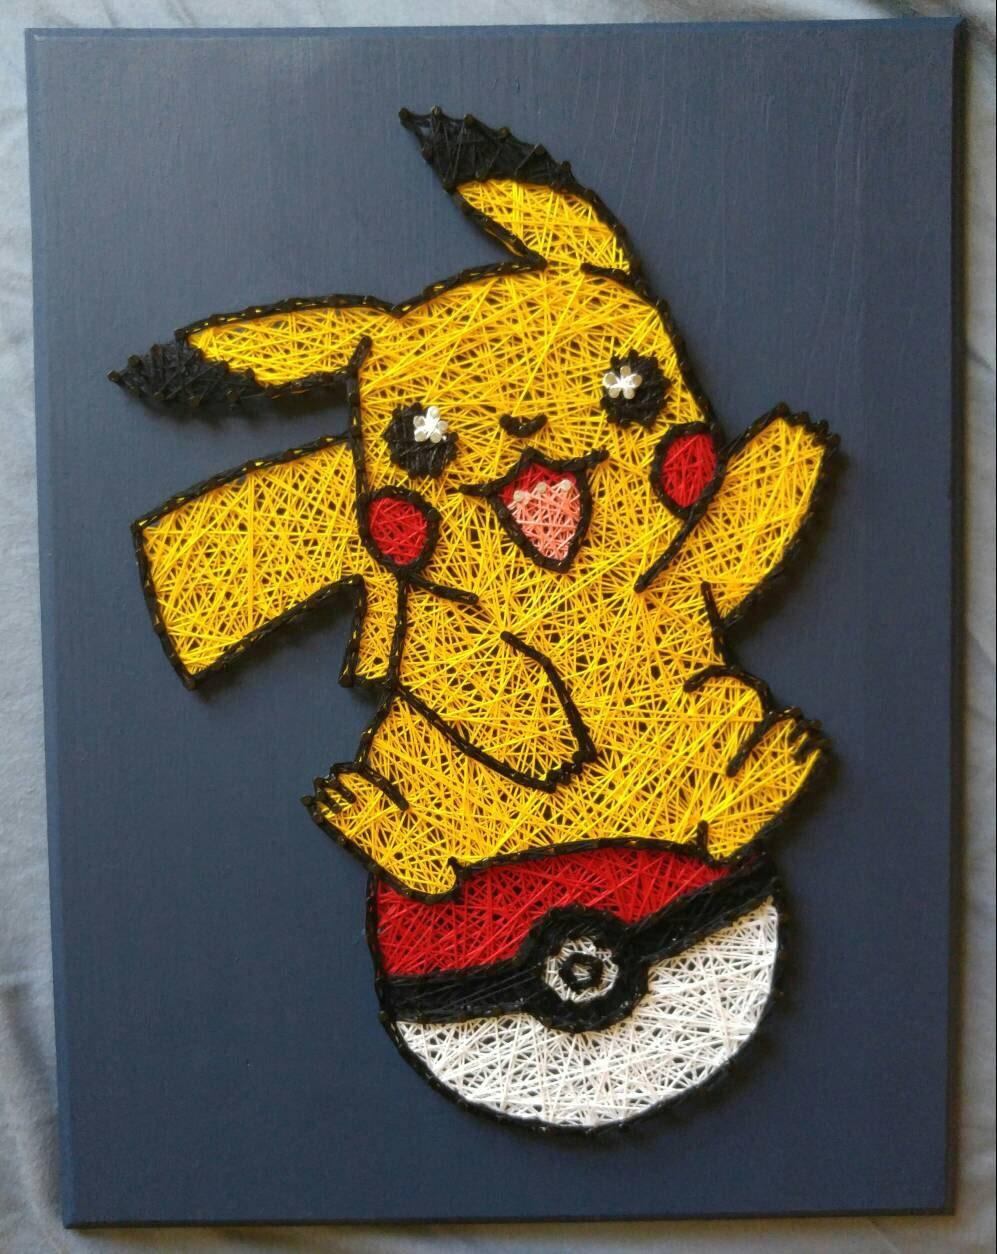 Pikachu Pokemon in Pokeball String Art | Etsy